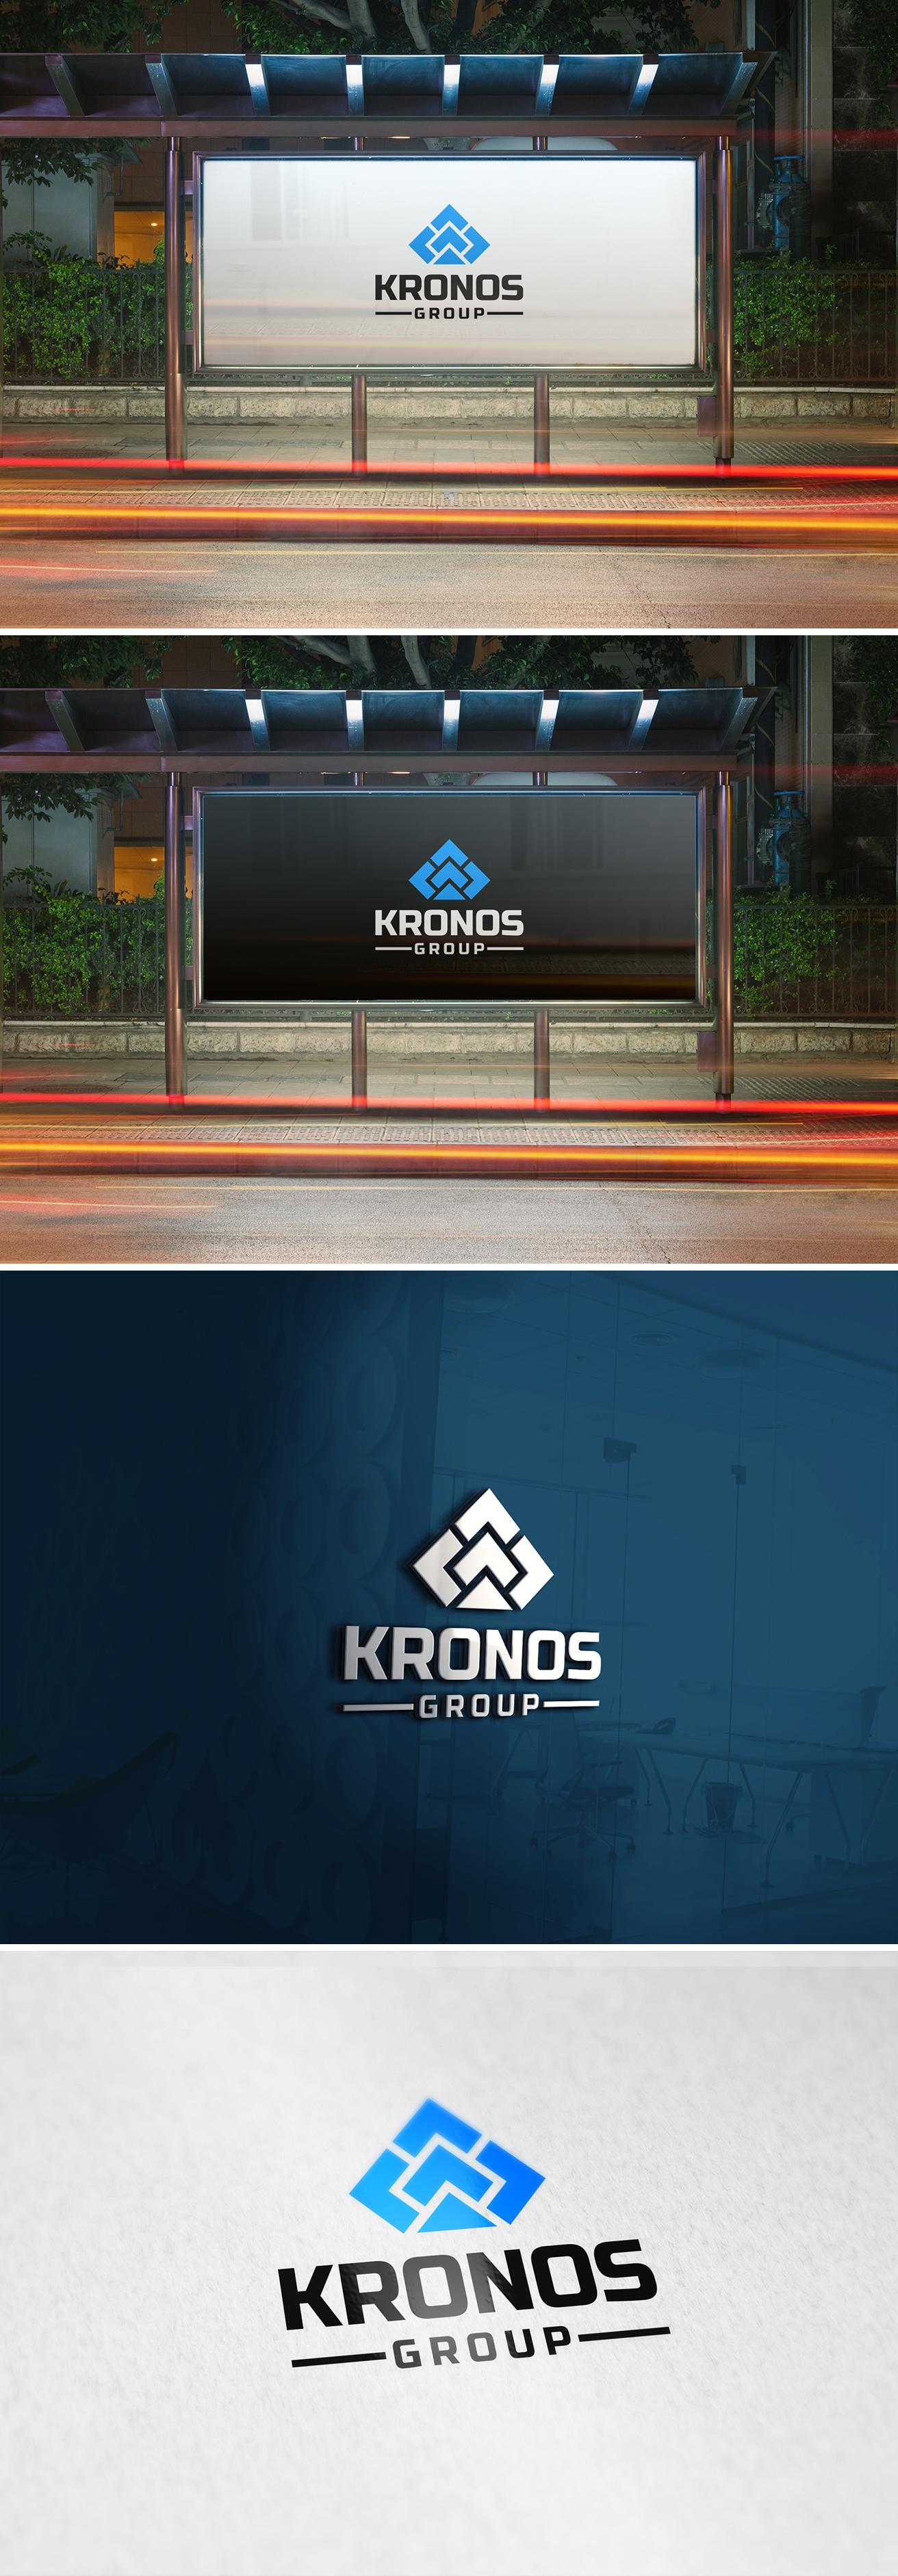 Разработать логотип KRONOS фото f_8385fafa785c8a89.jpg